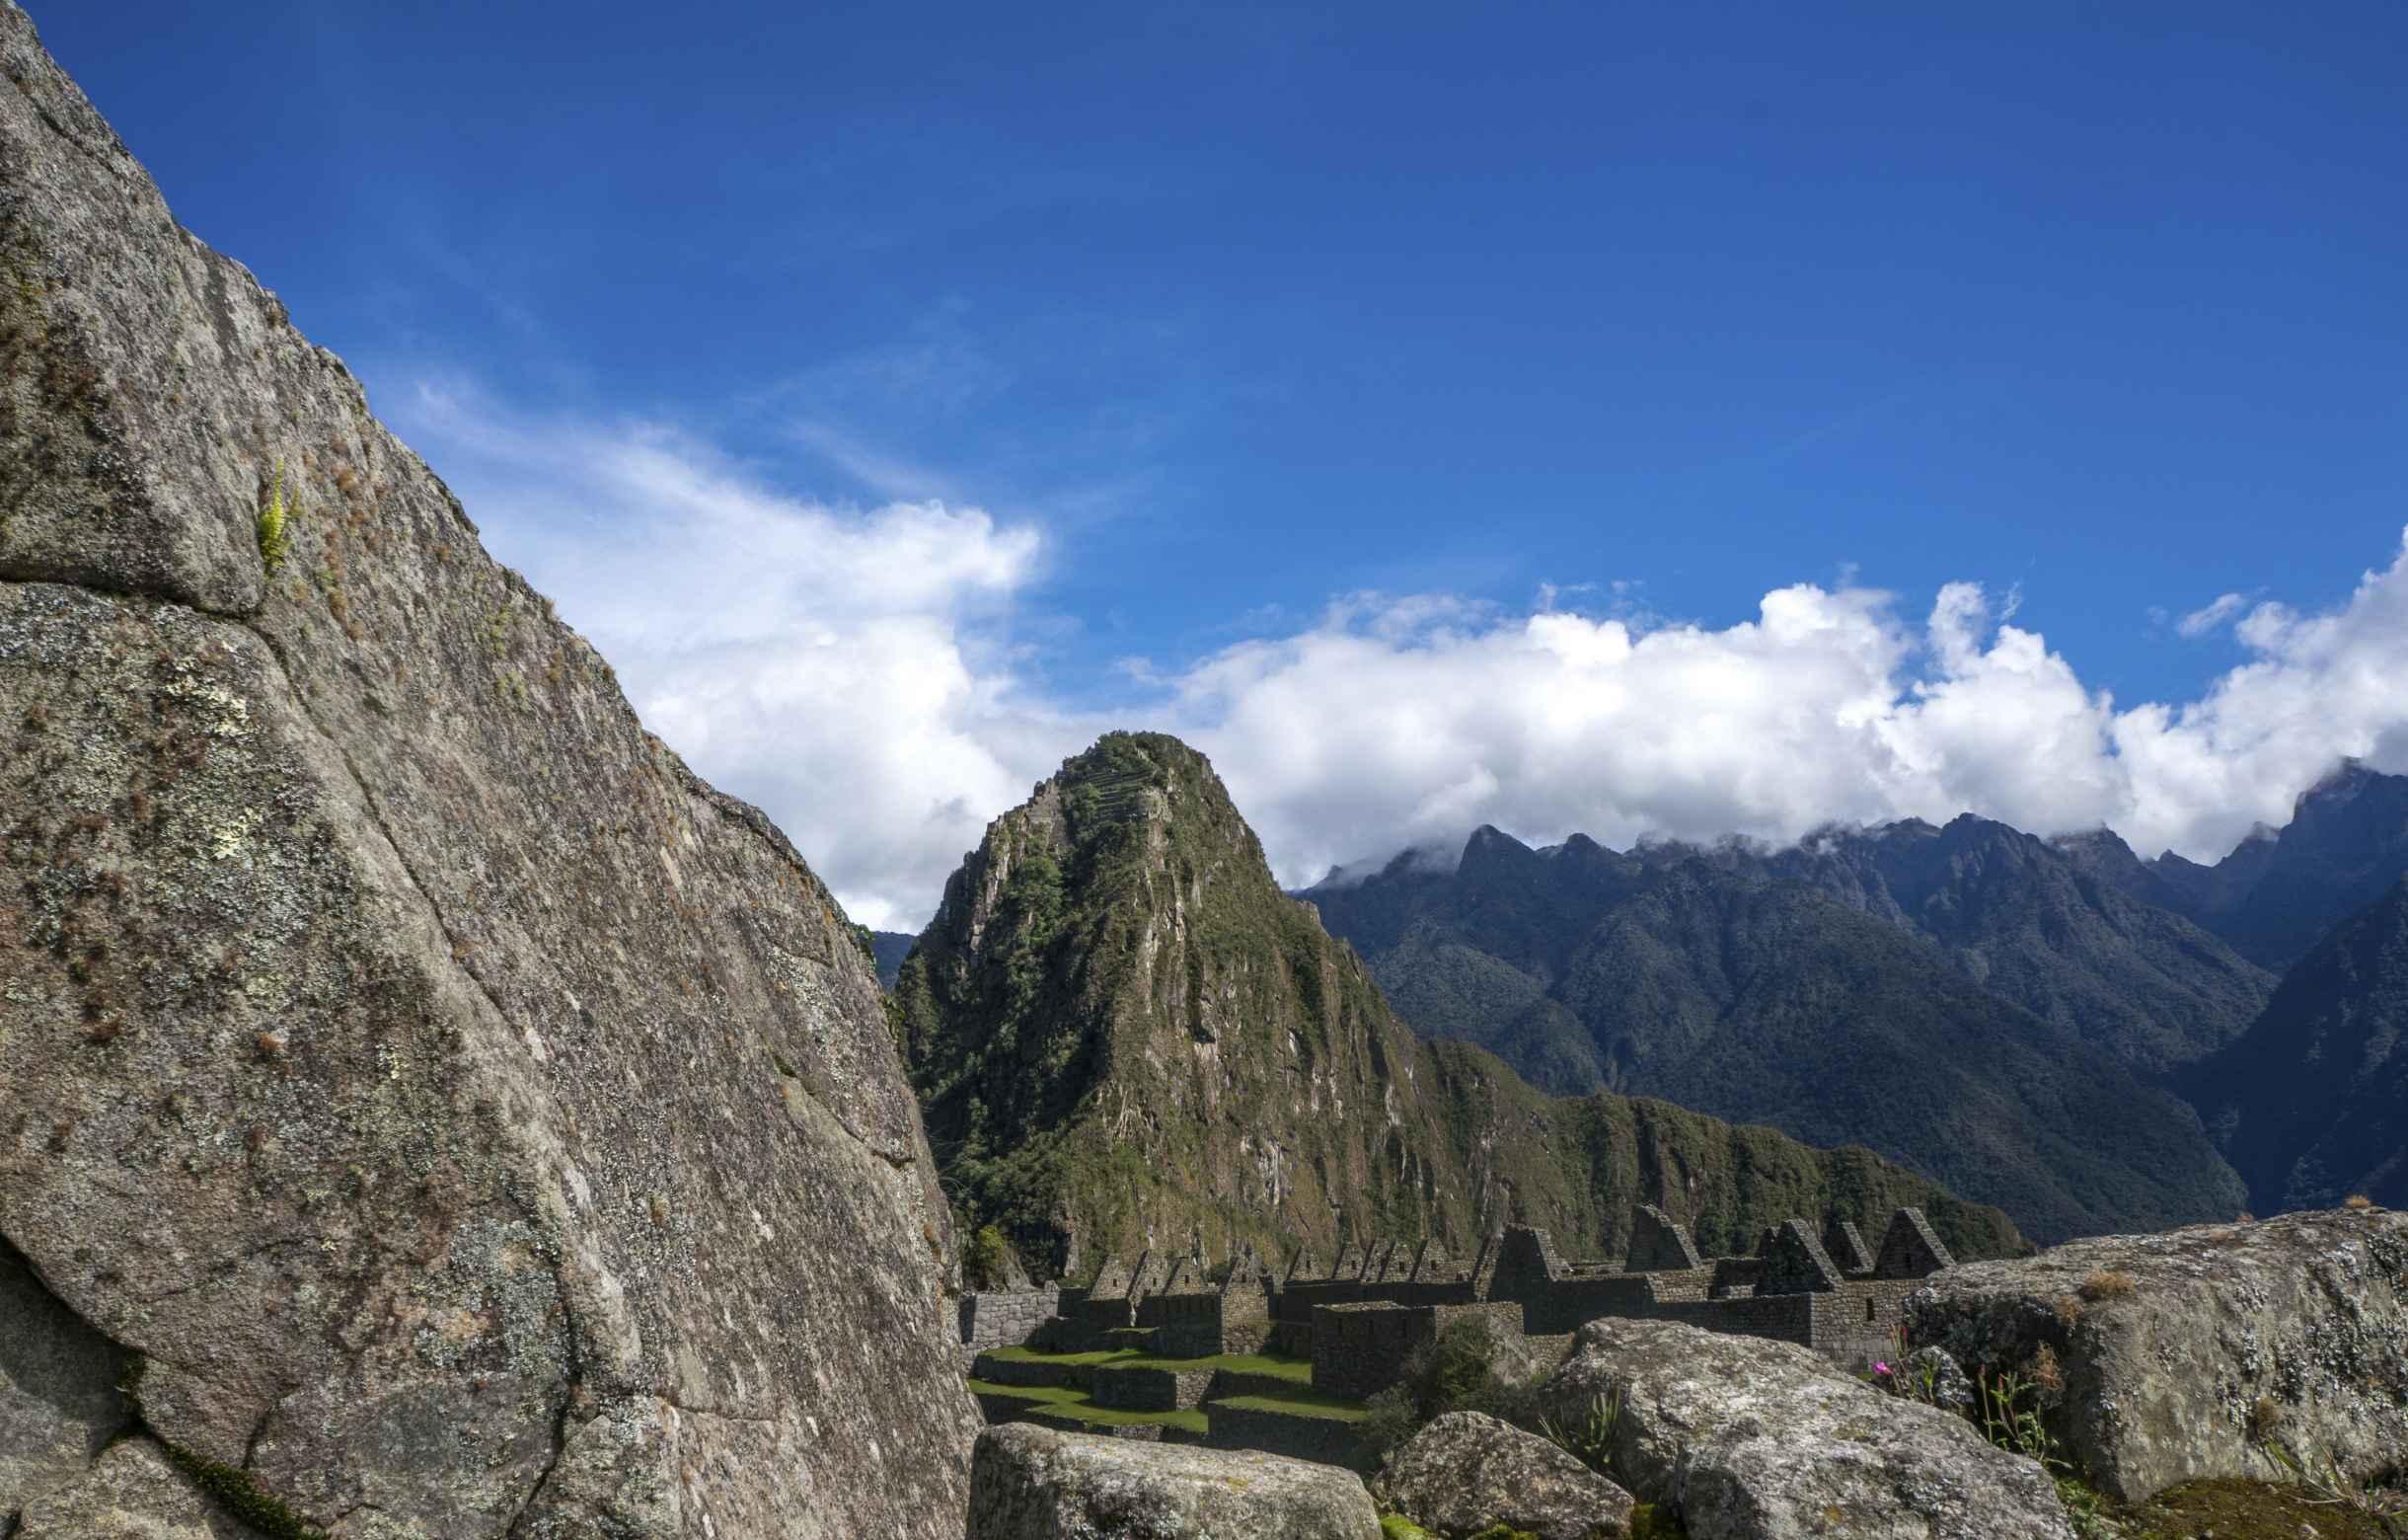 Americas - Andes Landscape